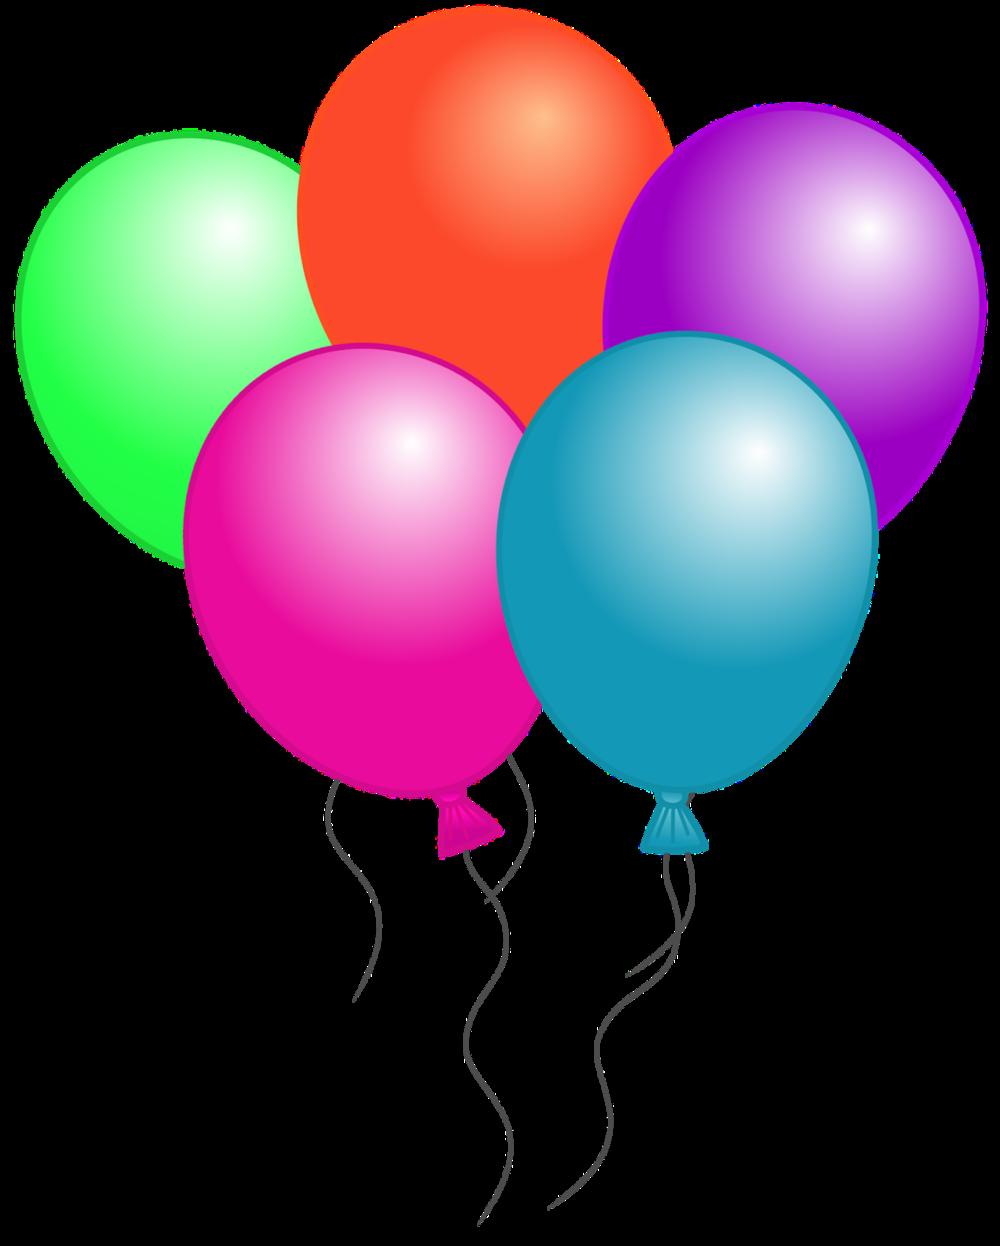 balloon-20clip-20art-Balloons1.png